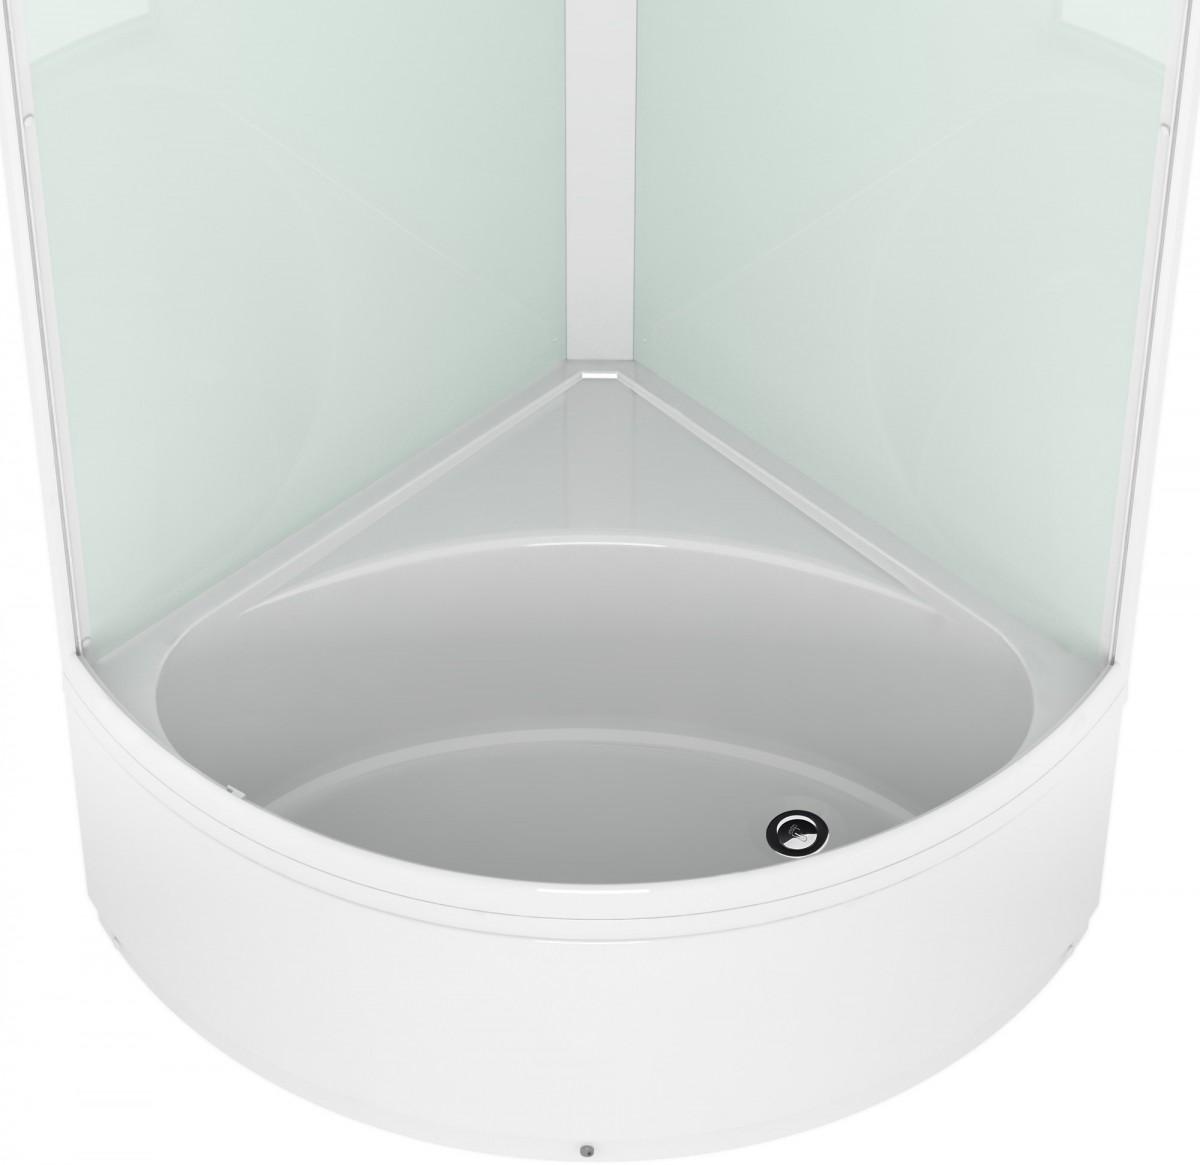 Душевая кабина Domani-Spa Simple high 90x90 сатин стекло / белые стенки с крышей